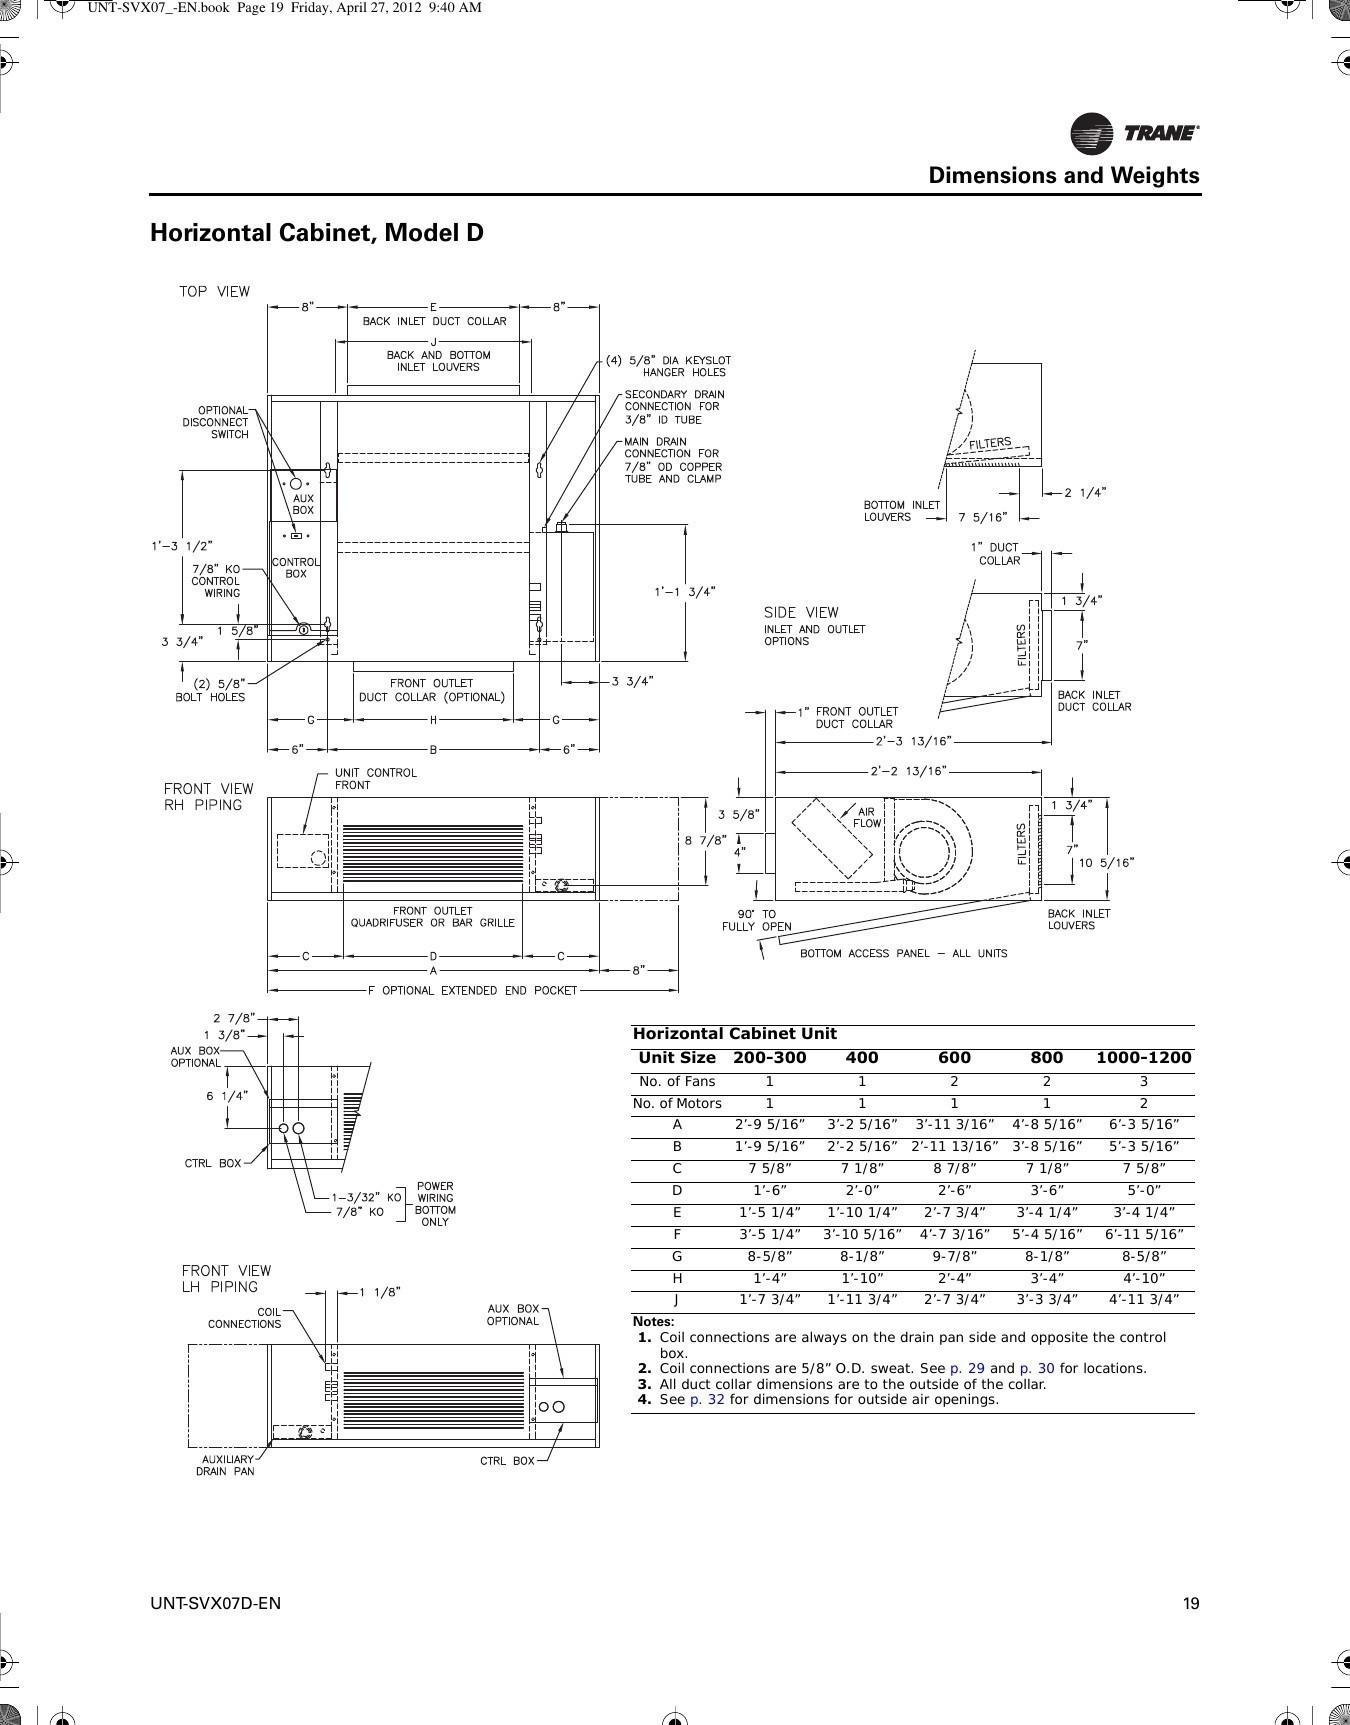 Electric Water Heater Wiring Diagram Wiring Diagram Electric Hot Water Heater Beautiful Wiring Diagram Of Electric Water Heater Wiring Diagram